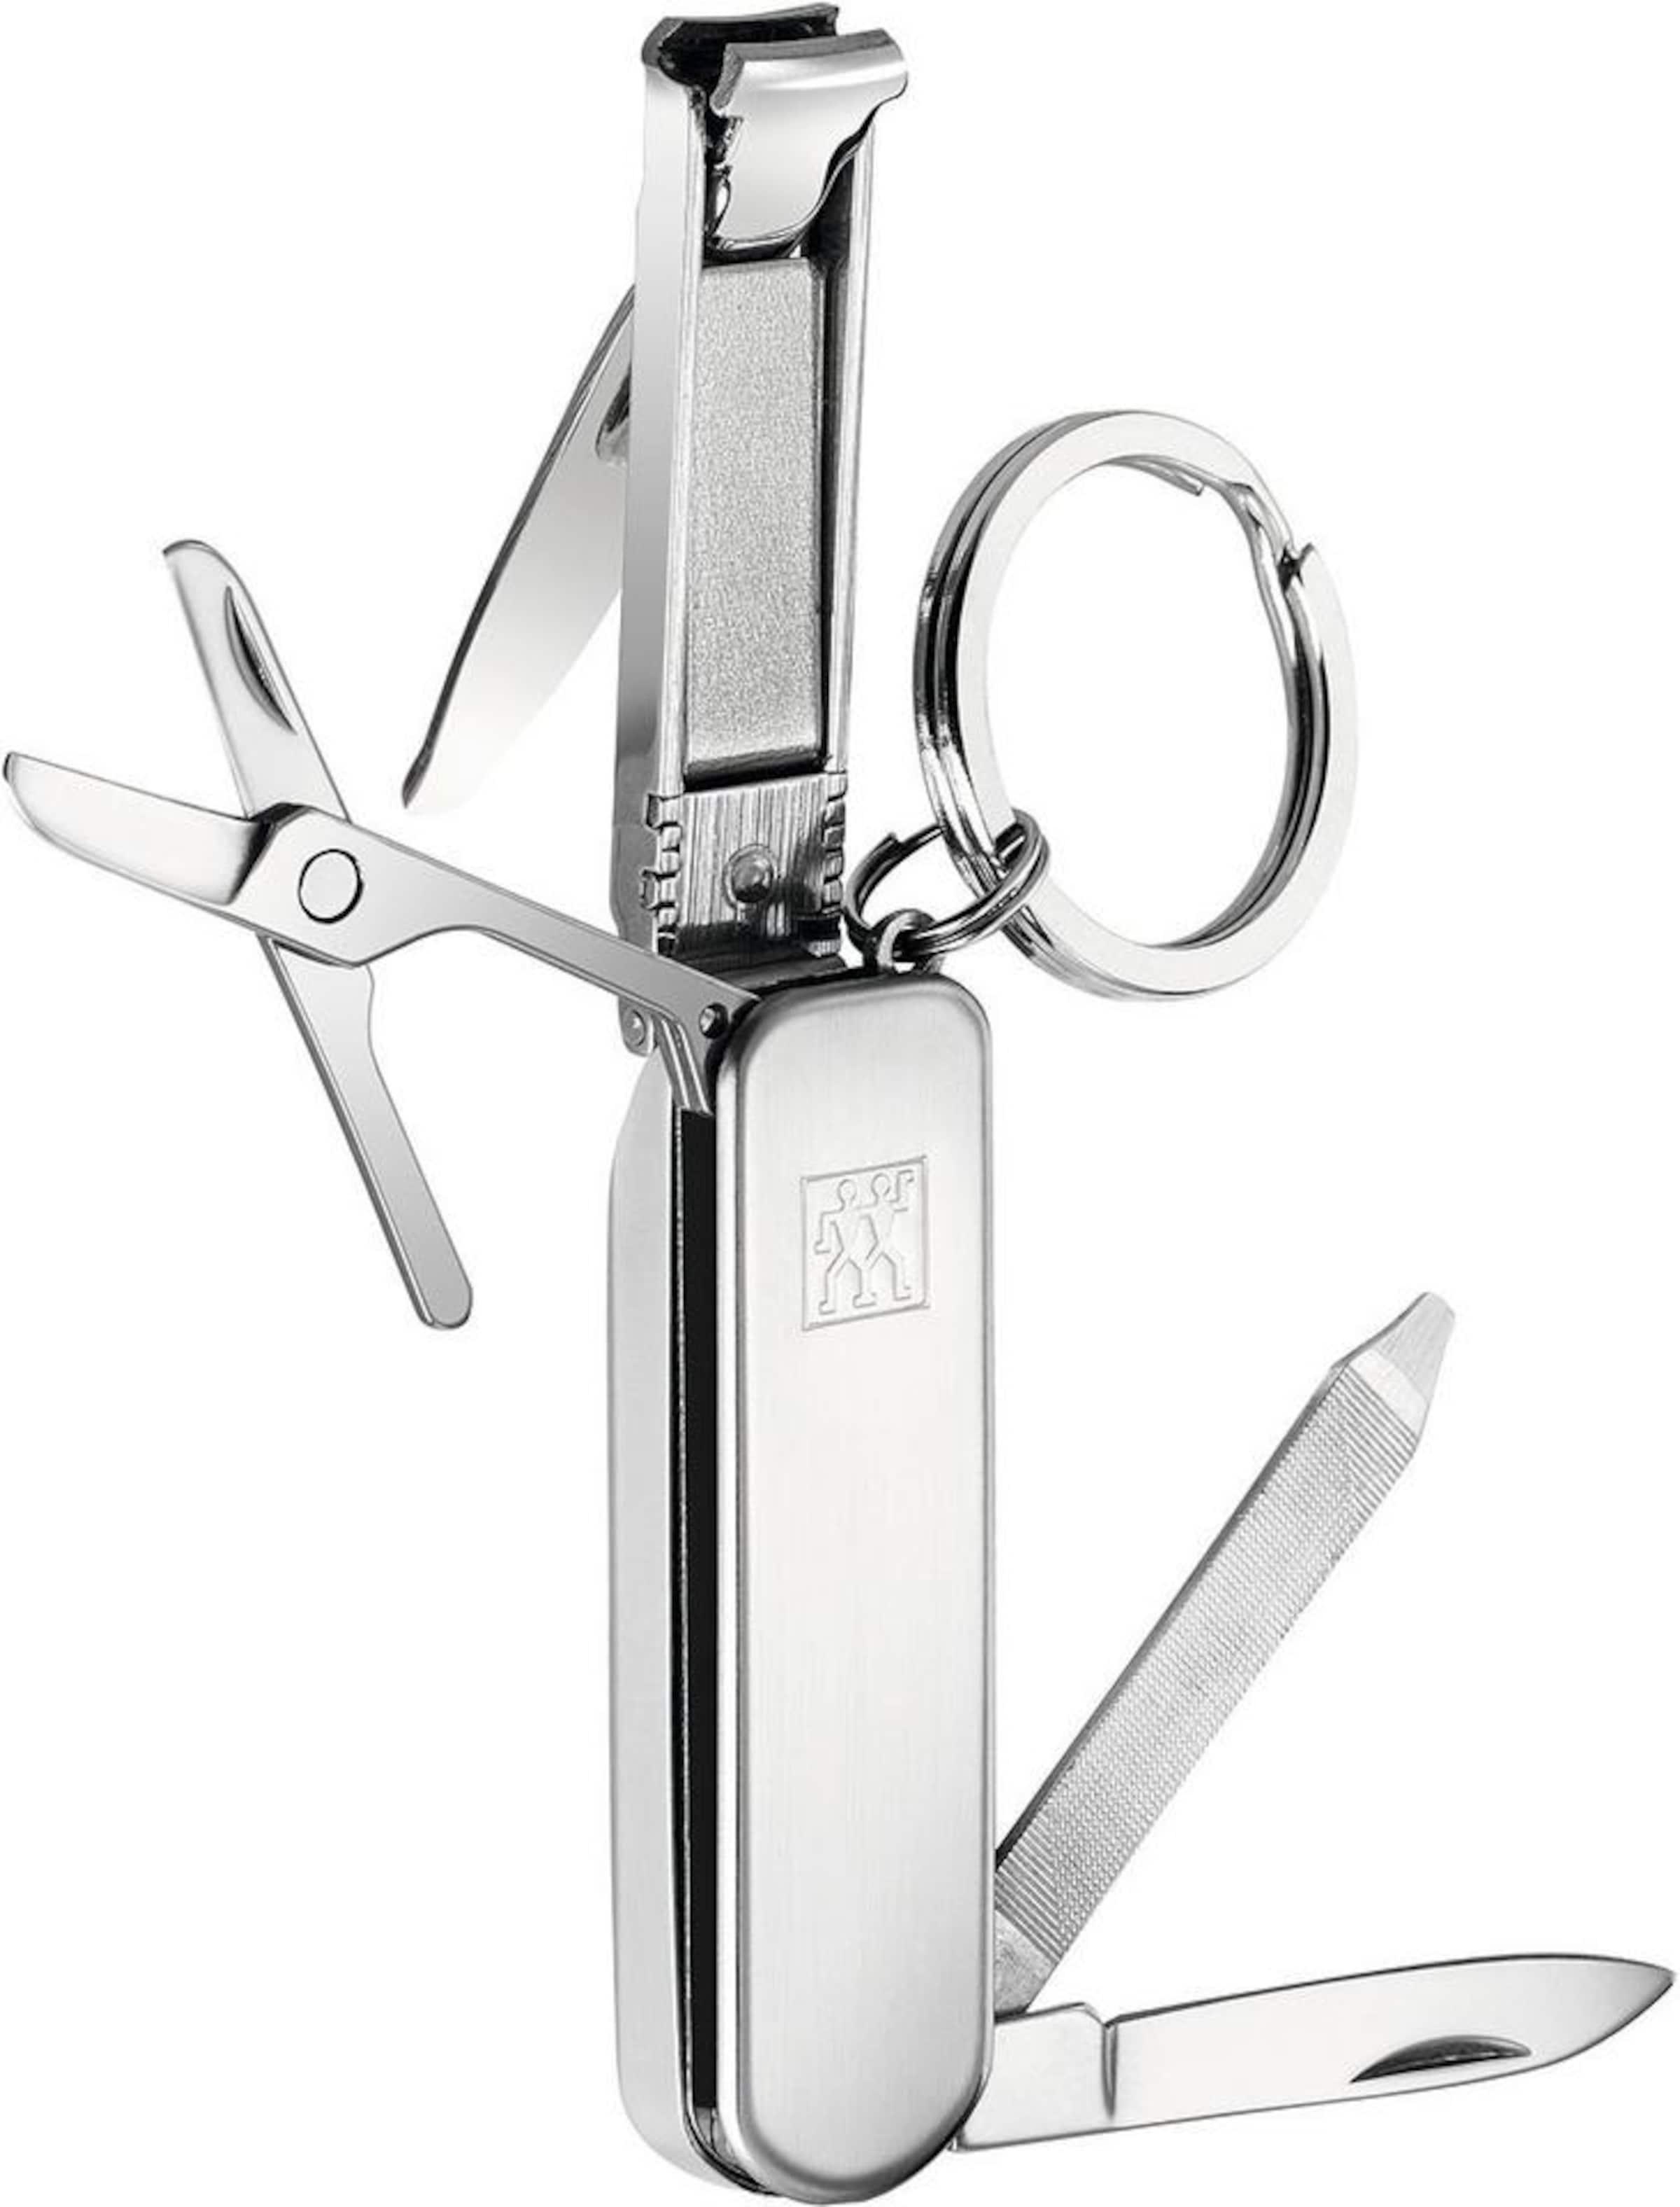 ZWILLING 'Multi-Tool' Classic INOX Serie Rabatt Manchester Großer Verkauf 6nl0VOfrnZ